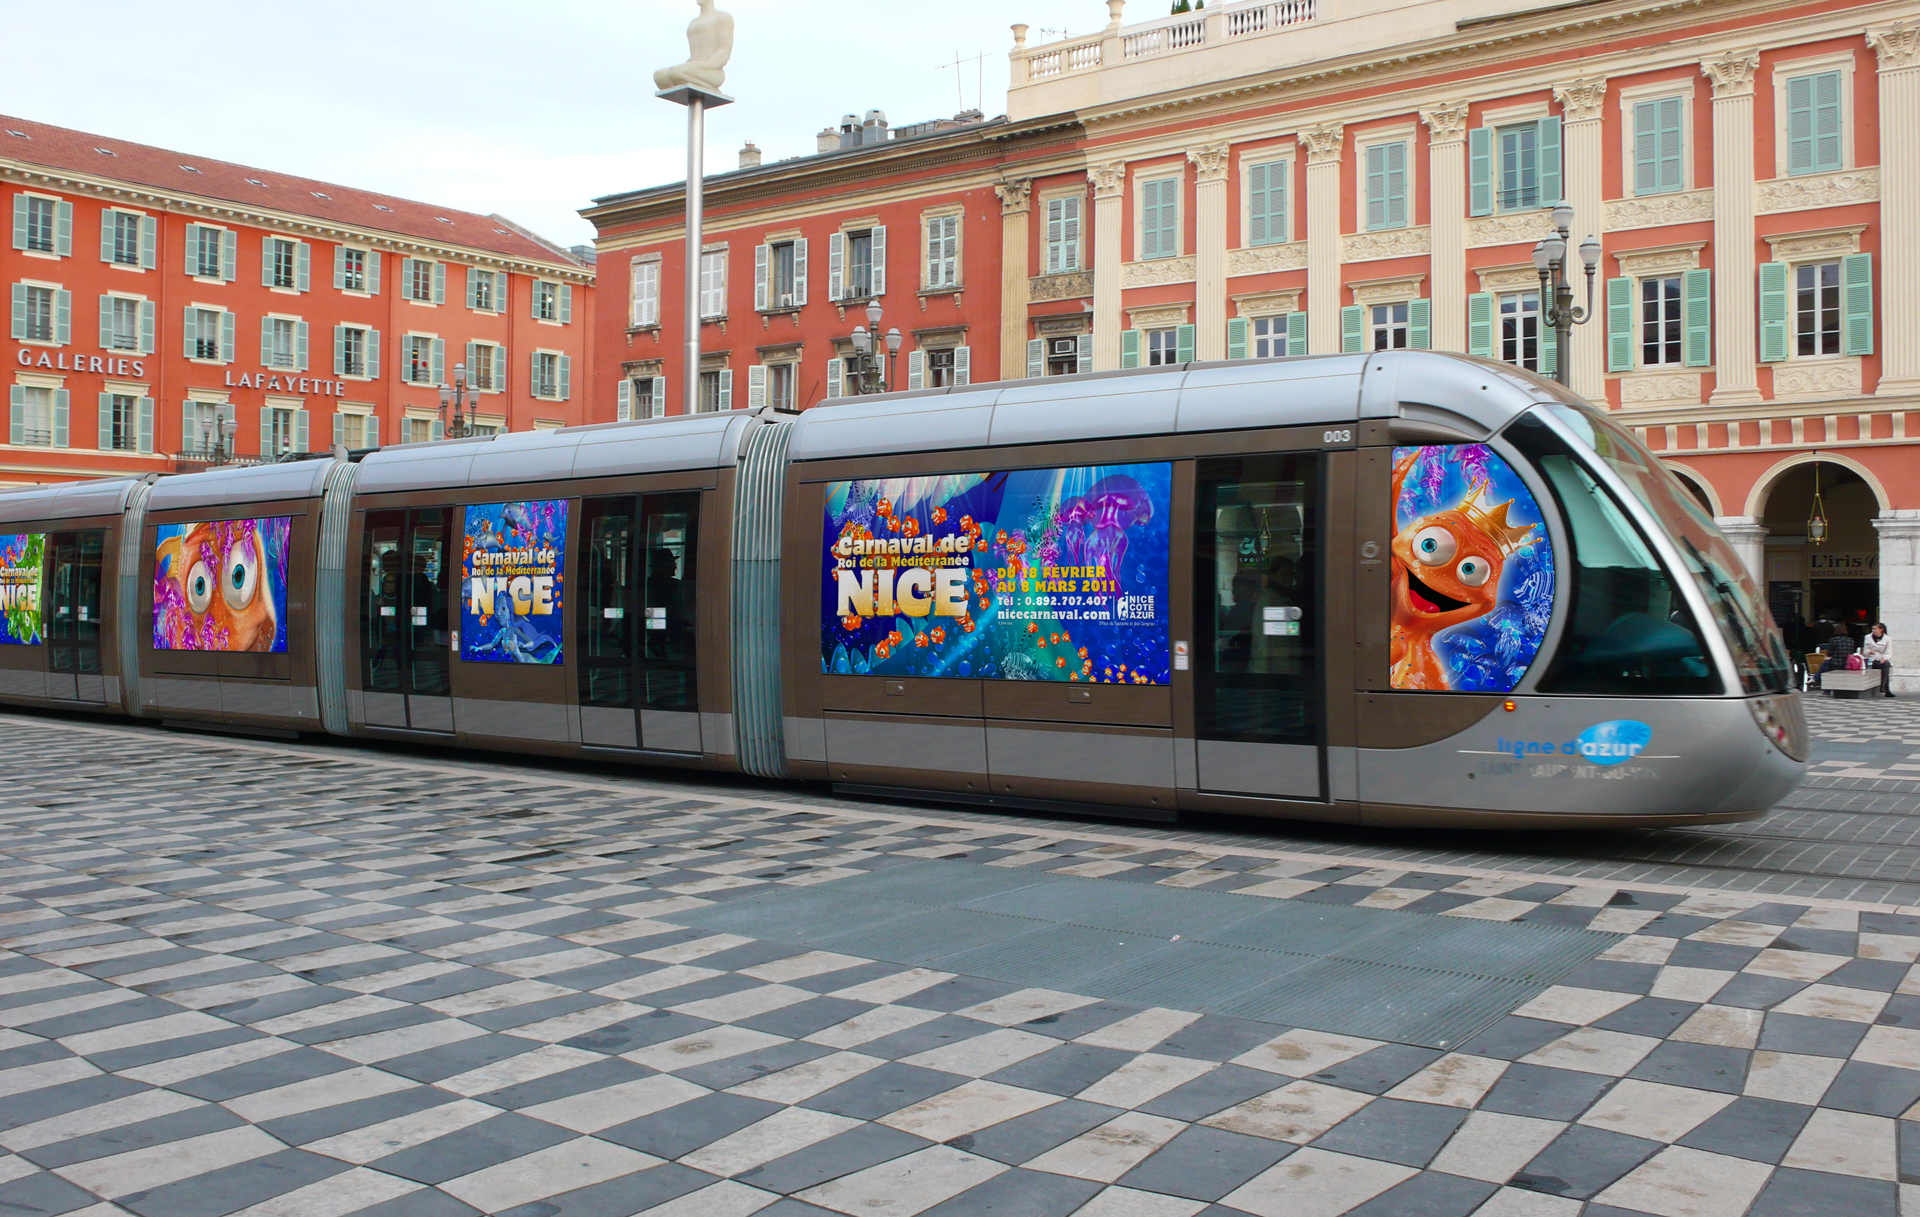 Habillage Tramway Annecy Nice Genève